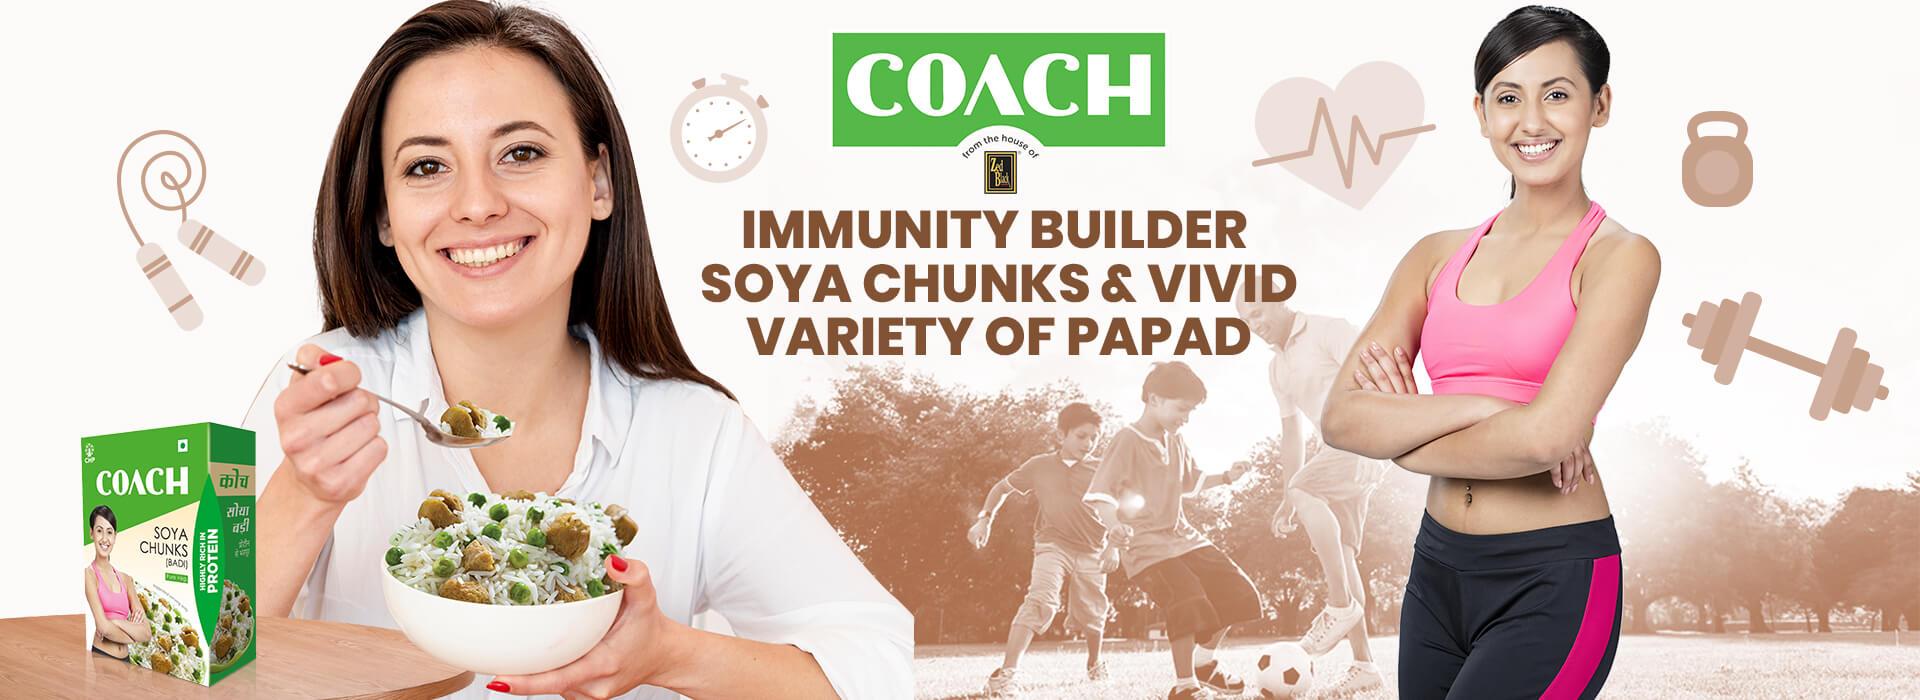 coach soya chunks immunity builder variety